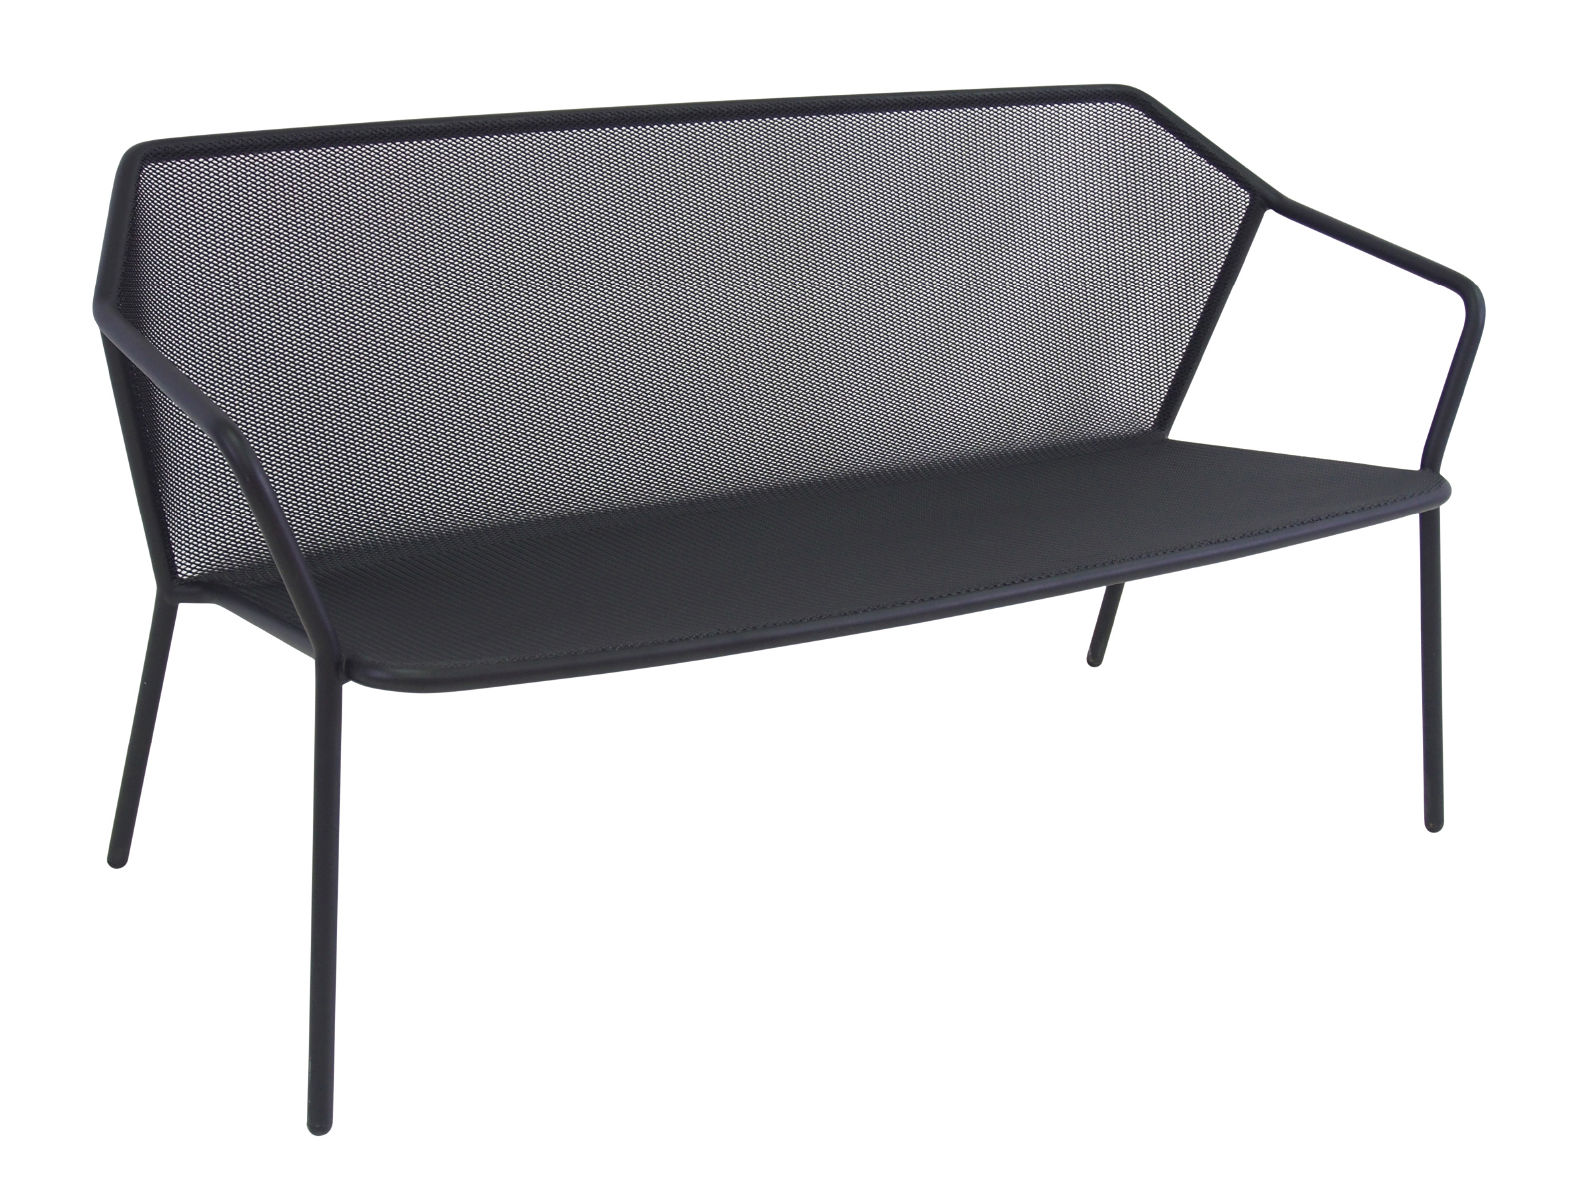 Outdoor - Sofas - Darwin Straight sofa - Metal - L 140 cm by Emu - Black - Varnished steel